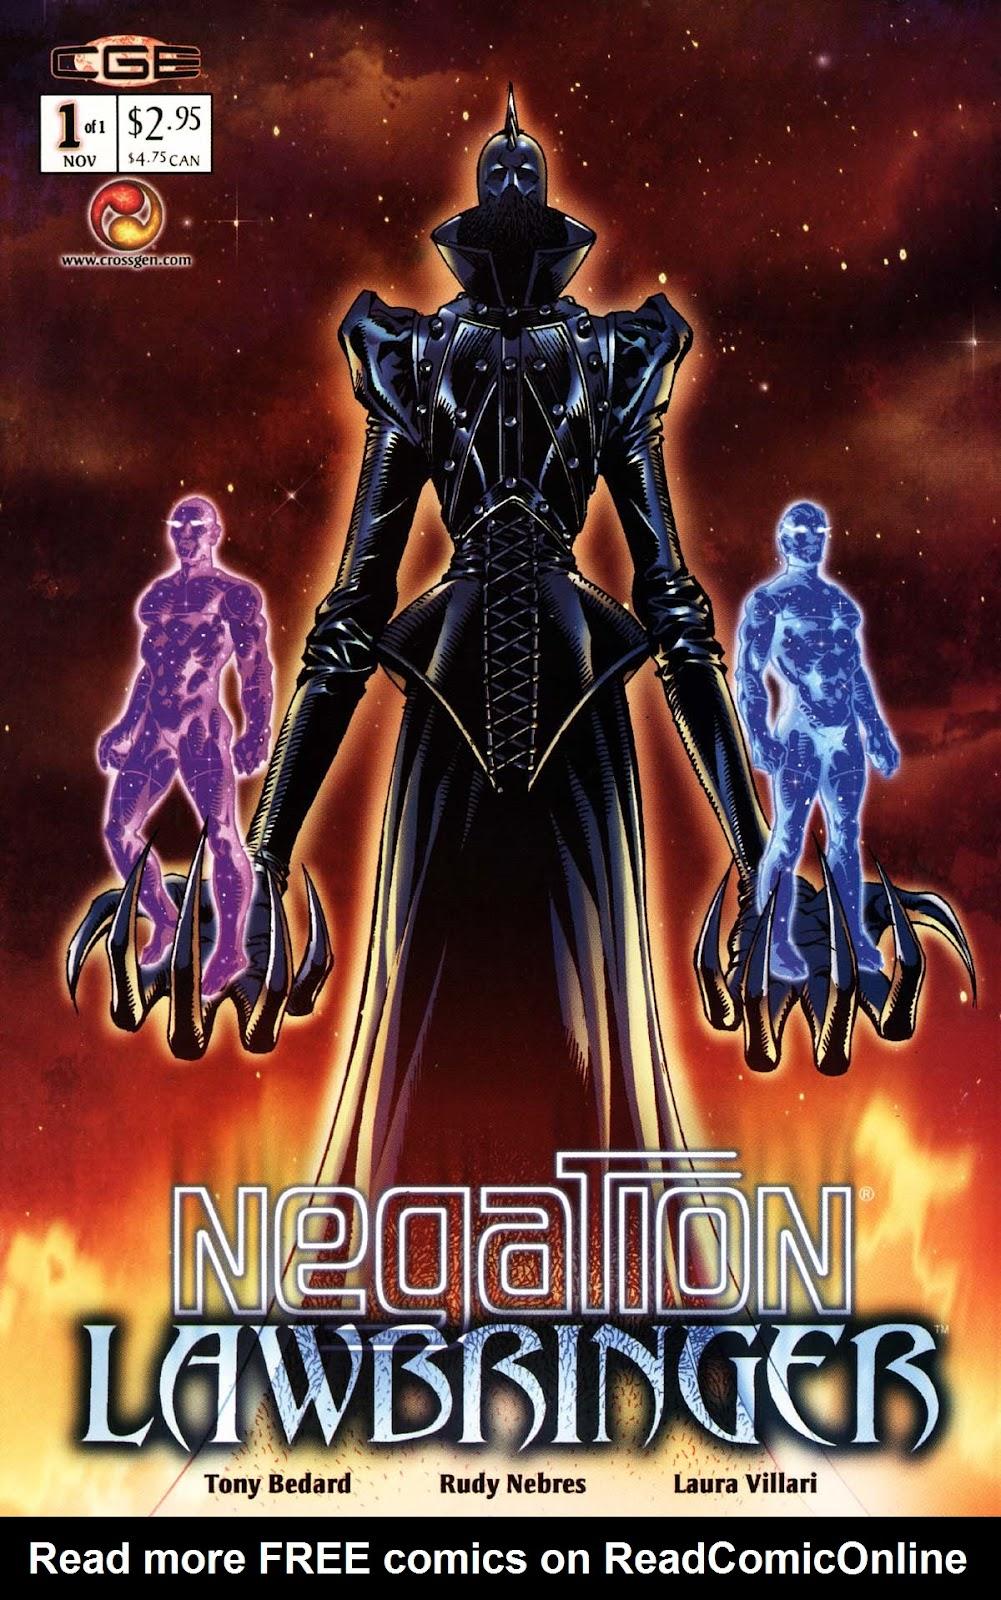 Read online Negation Lawbringer comic -  Issue # Full - 1